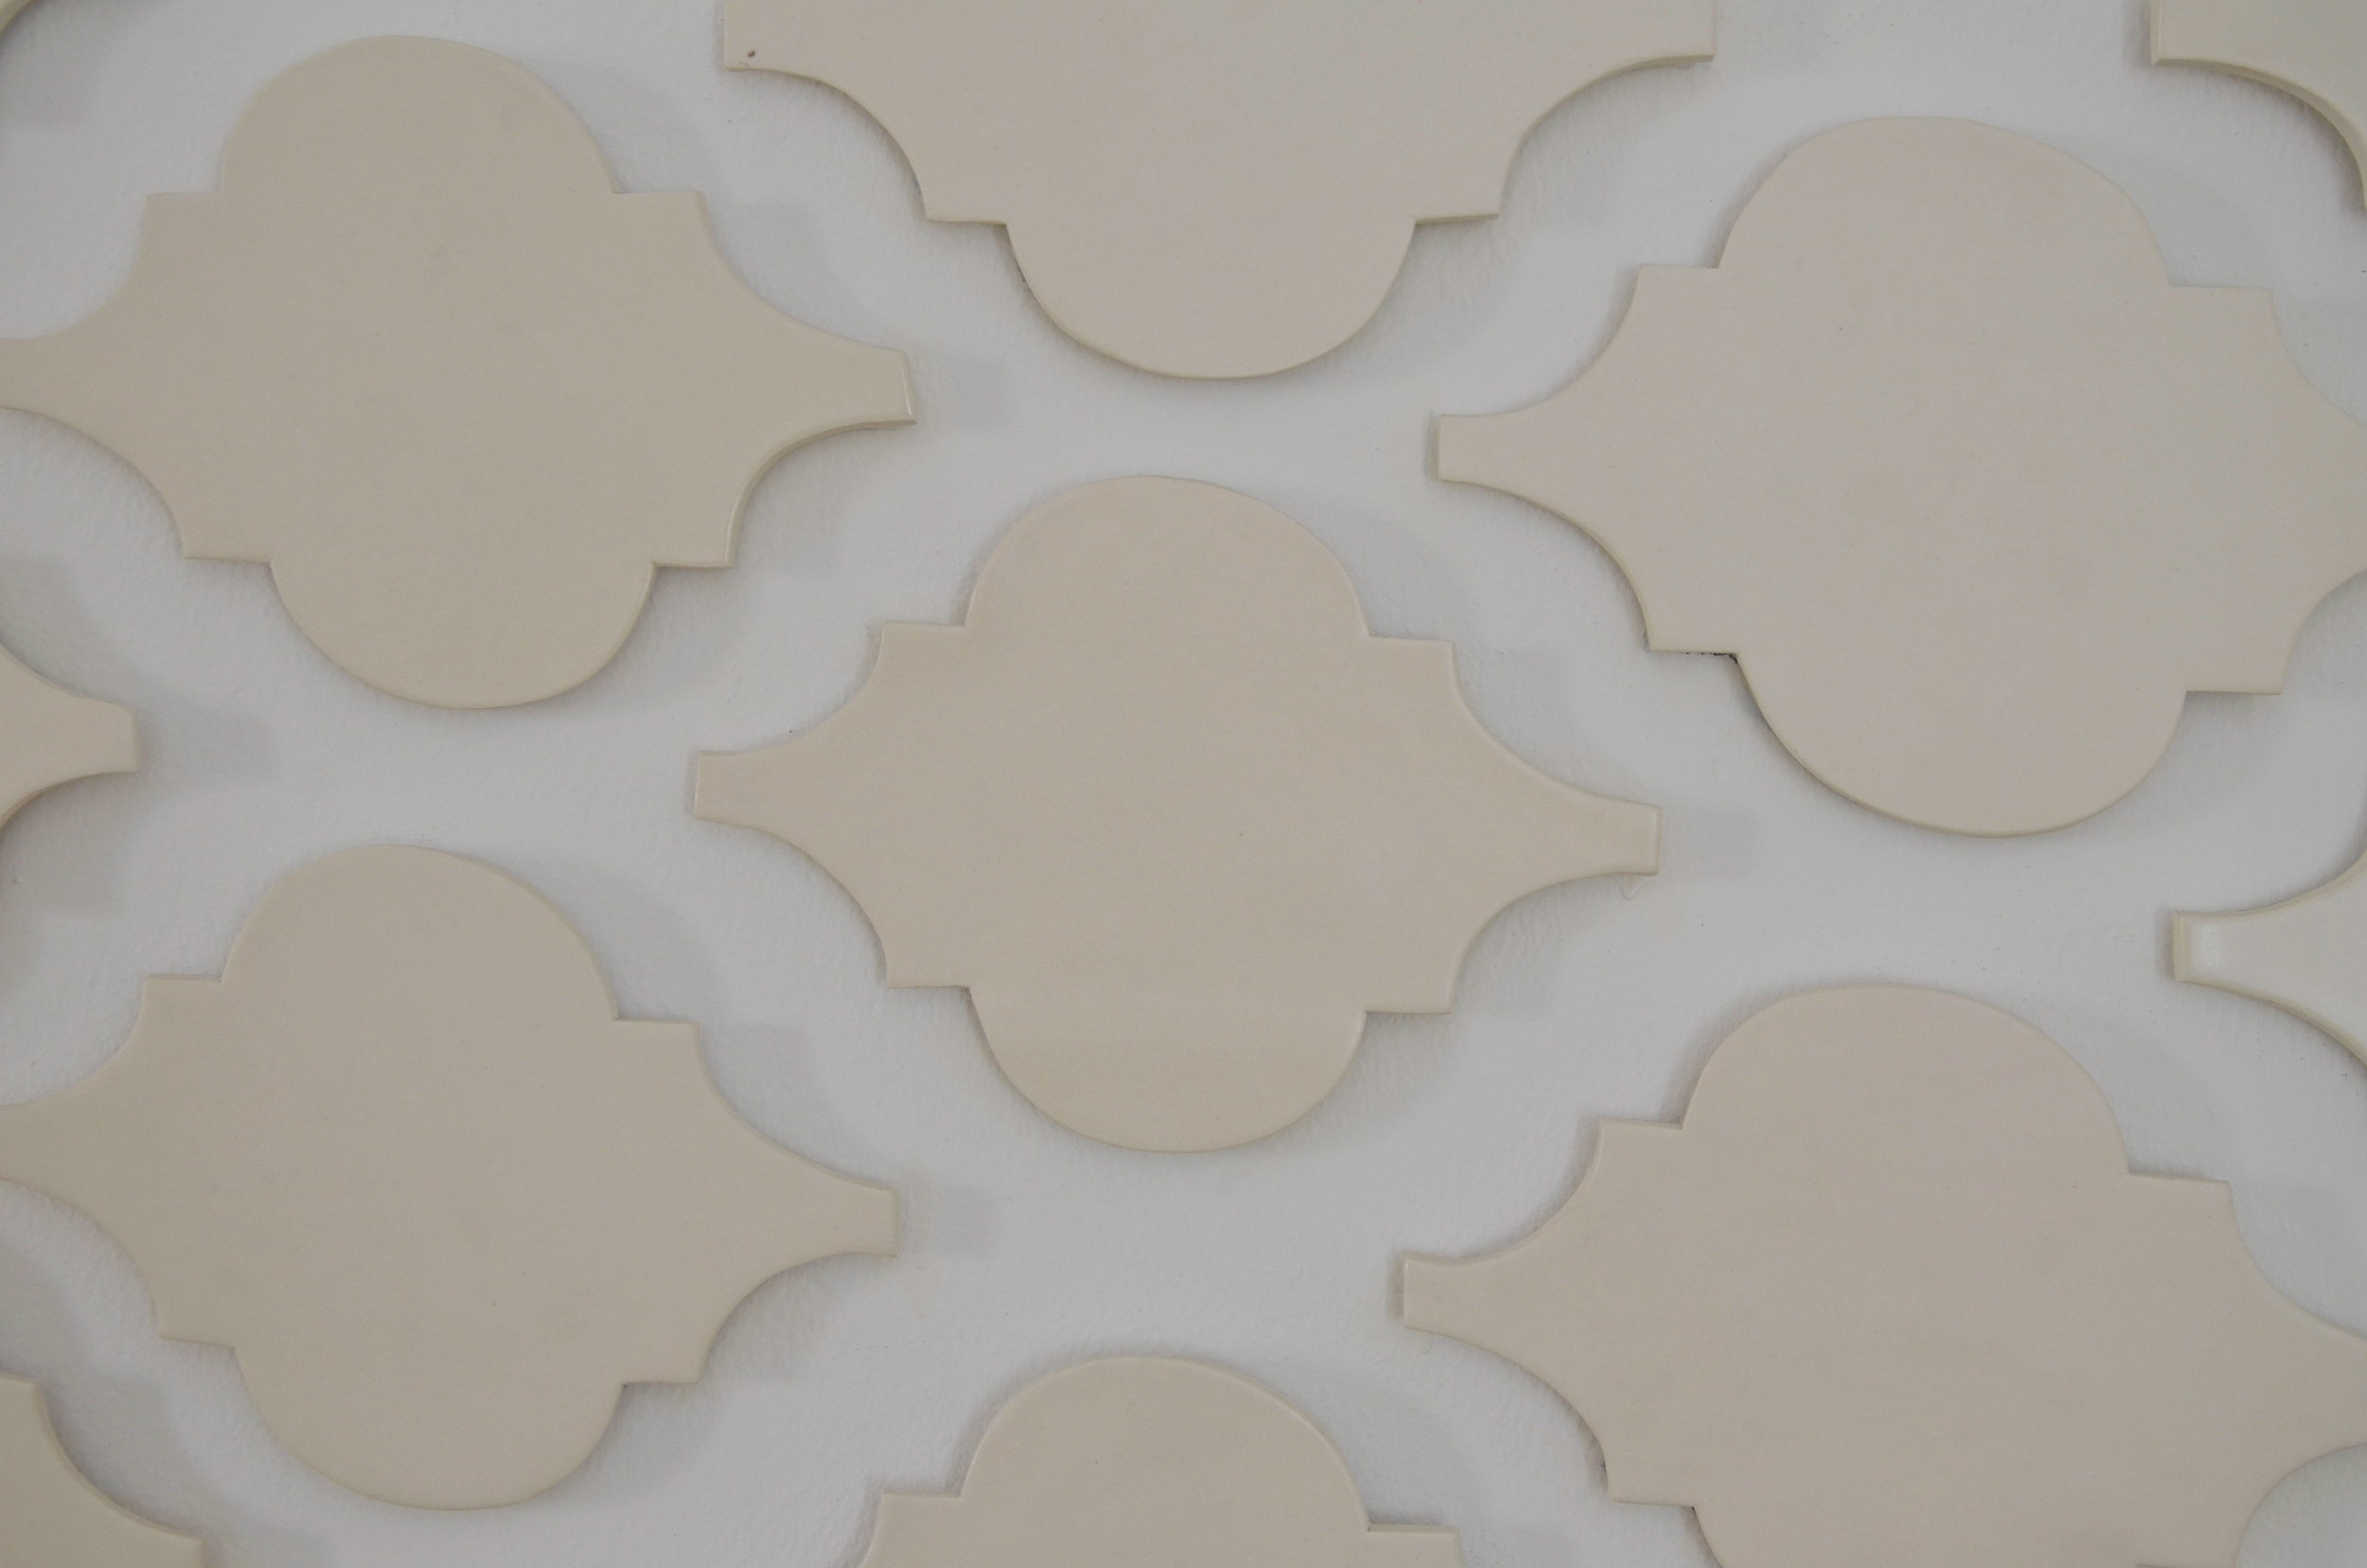 """Something in the house""detail, 2016 ceramic tile 300x700cm"